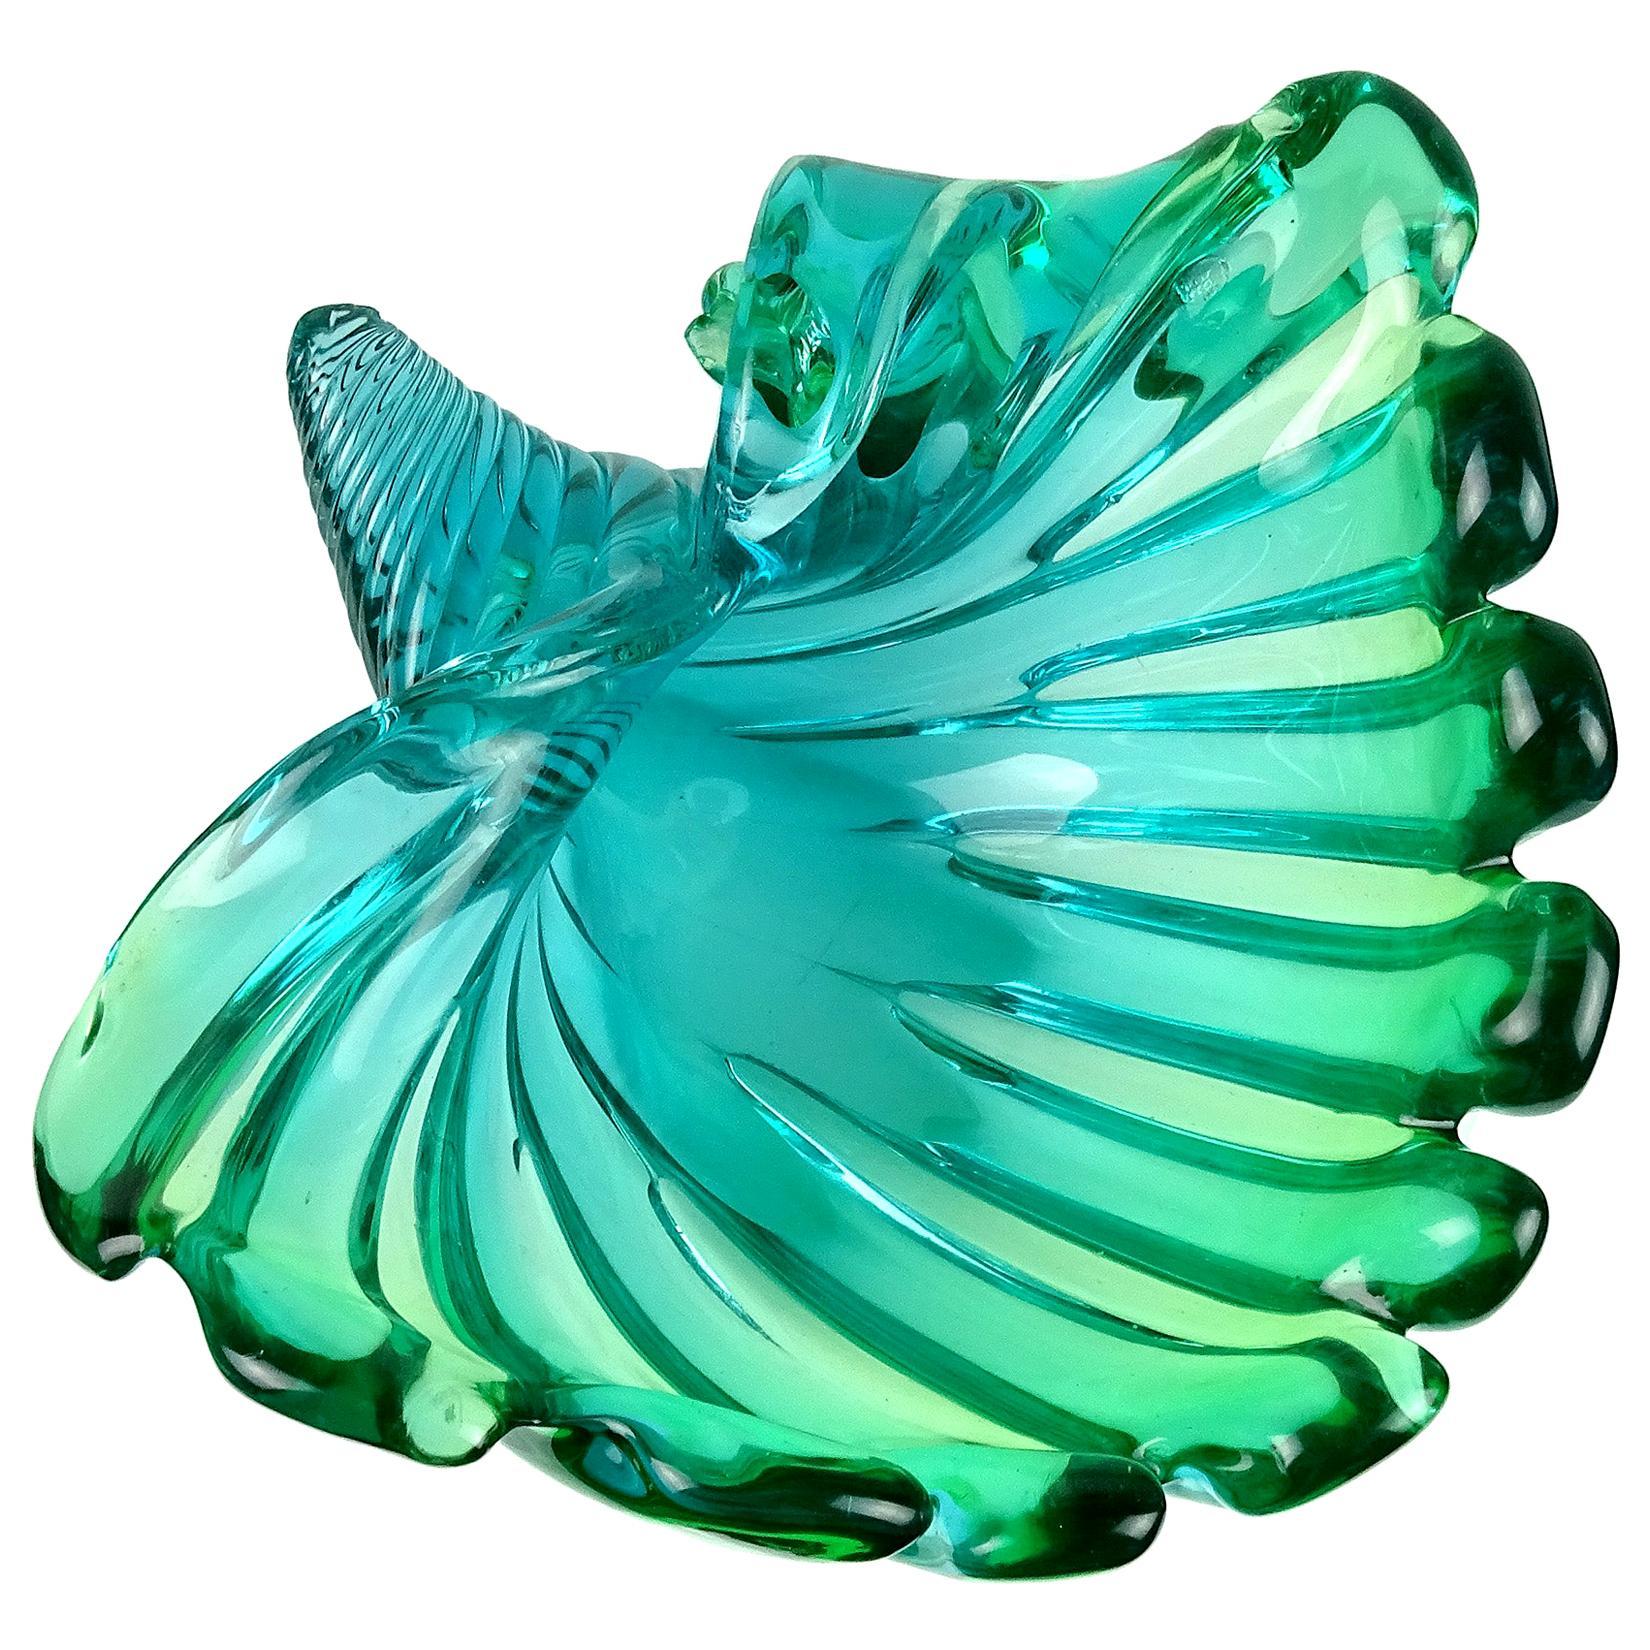 Murano Sommerso Blue Green Italian Art Glass Flared Seashell Sculpture Bowl